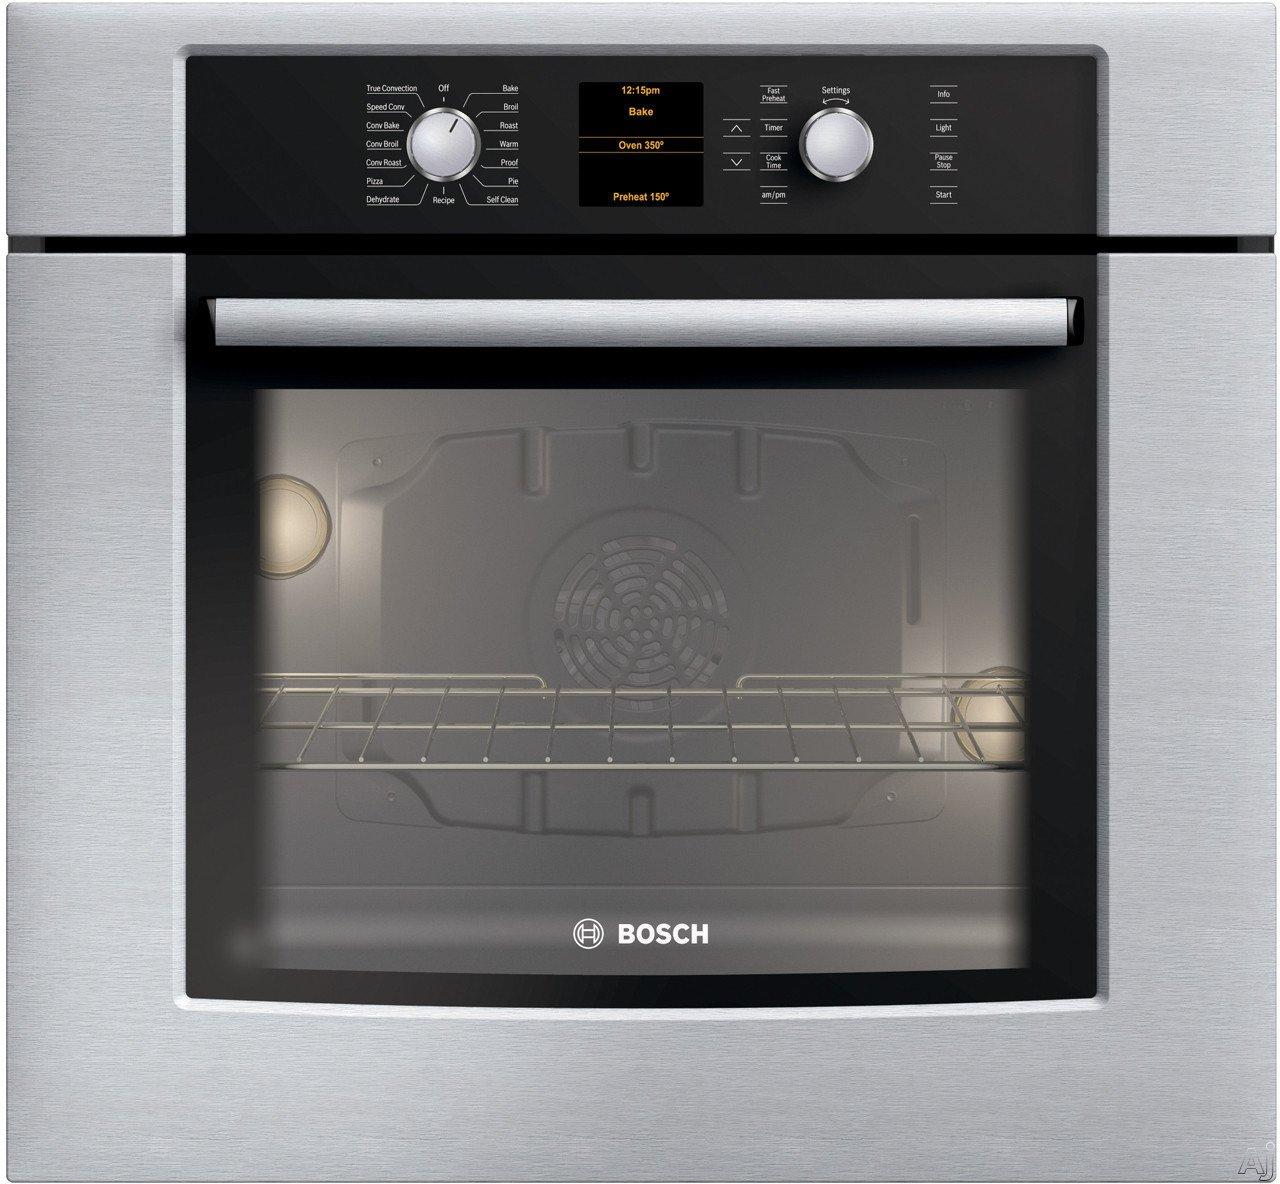 Amazon.com: Bosch 500 Series hbn5450uc 27